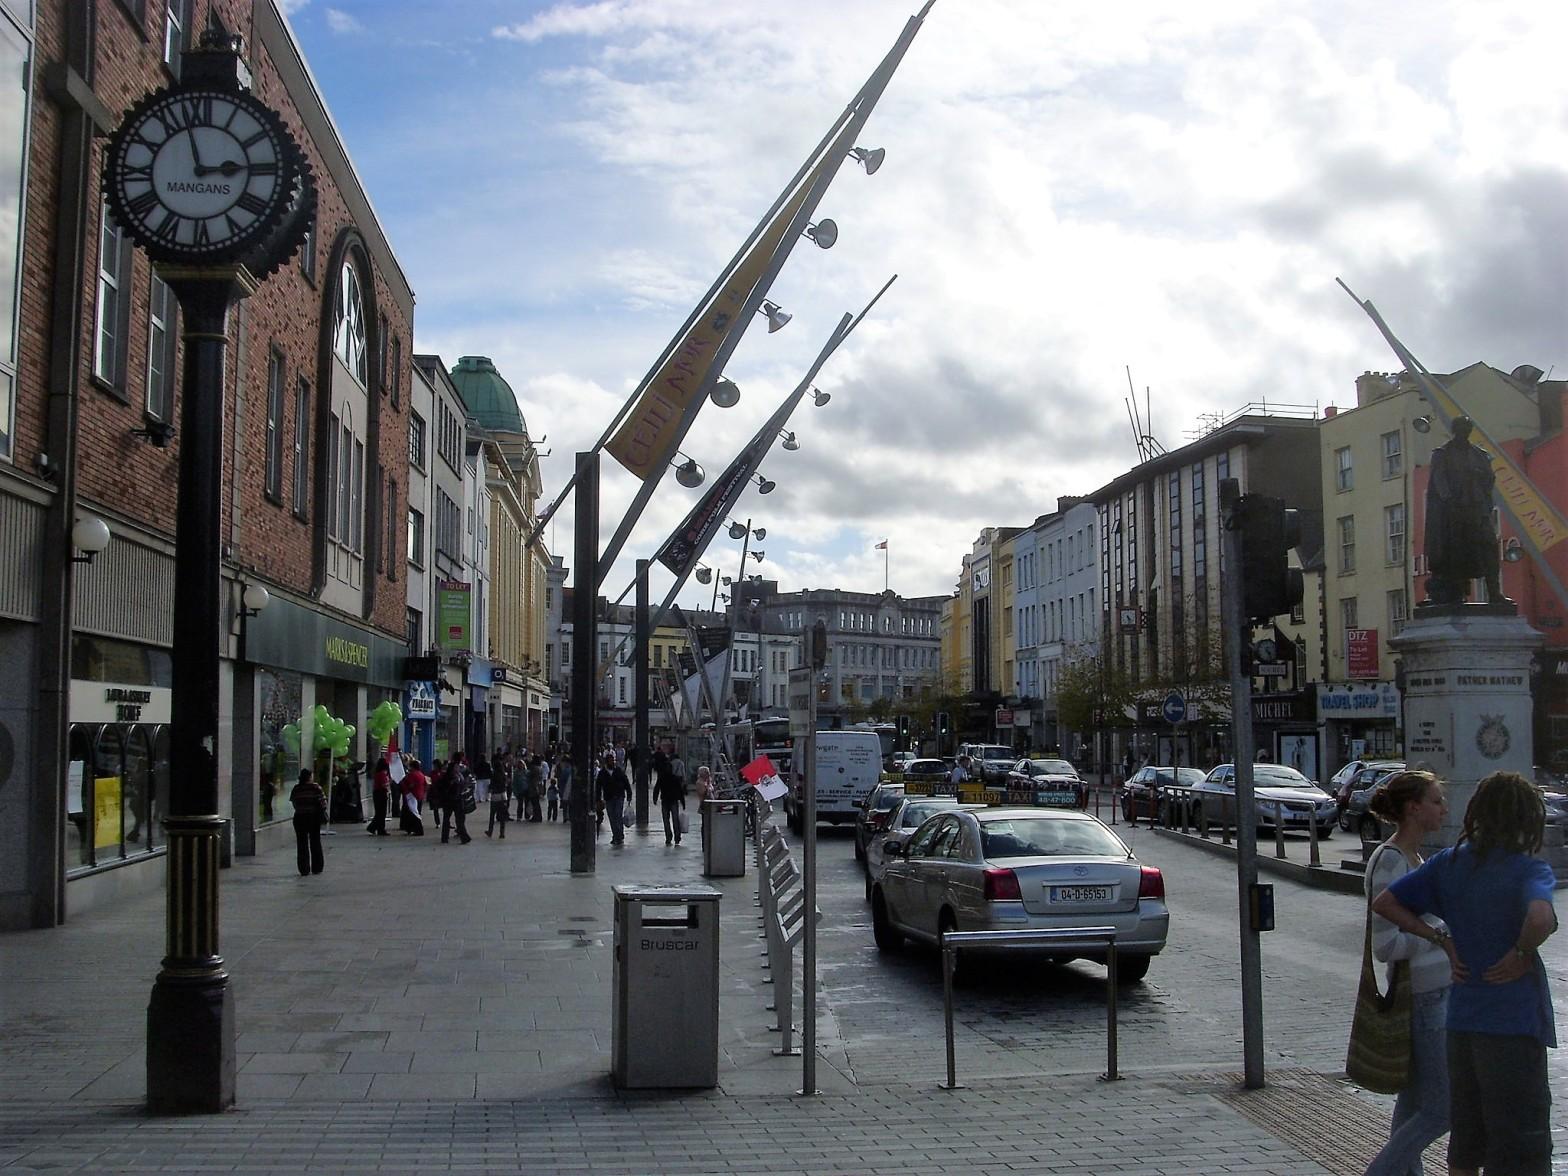 Patrick street, the main street in Cork